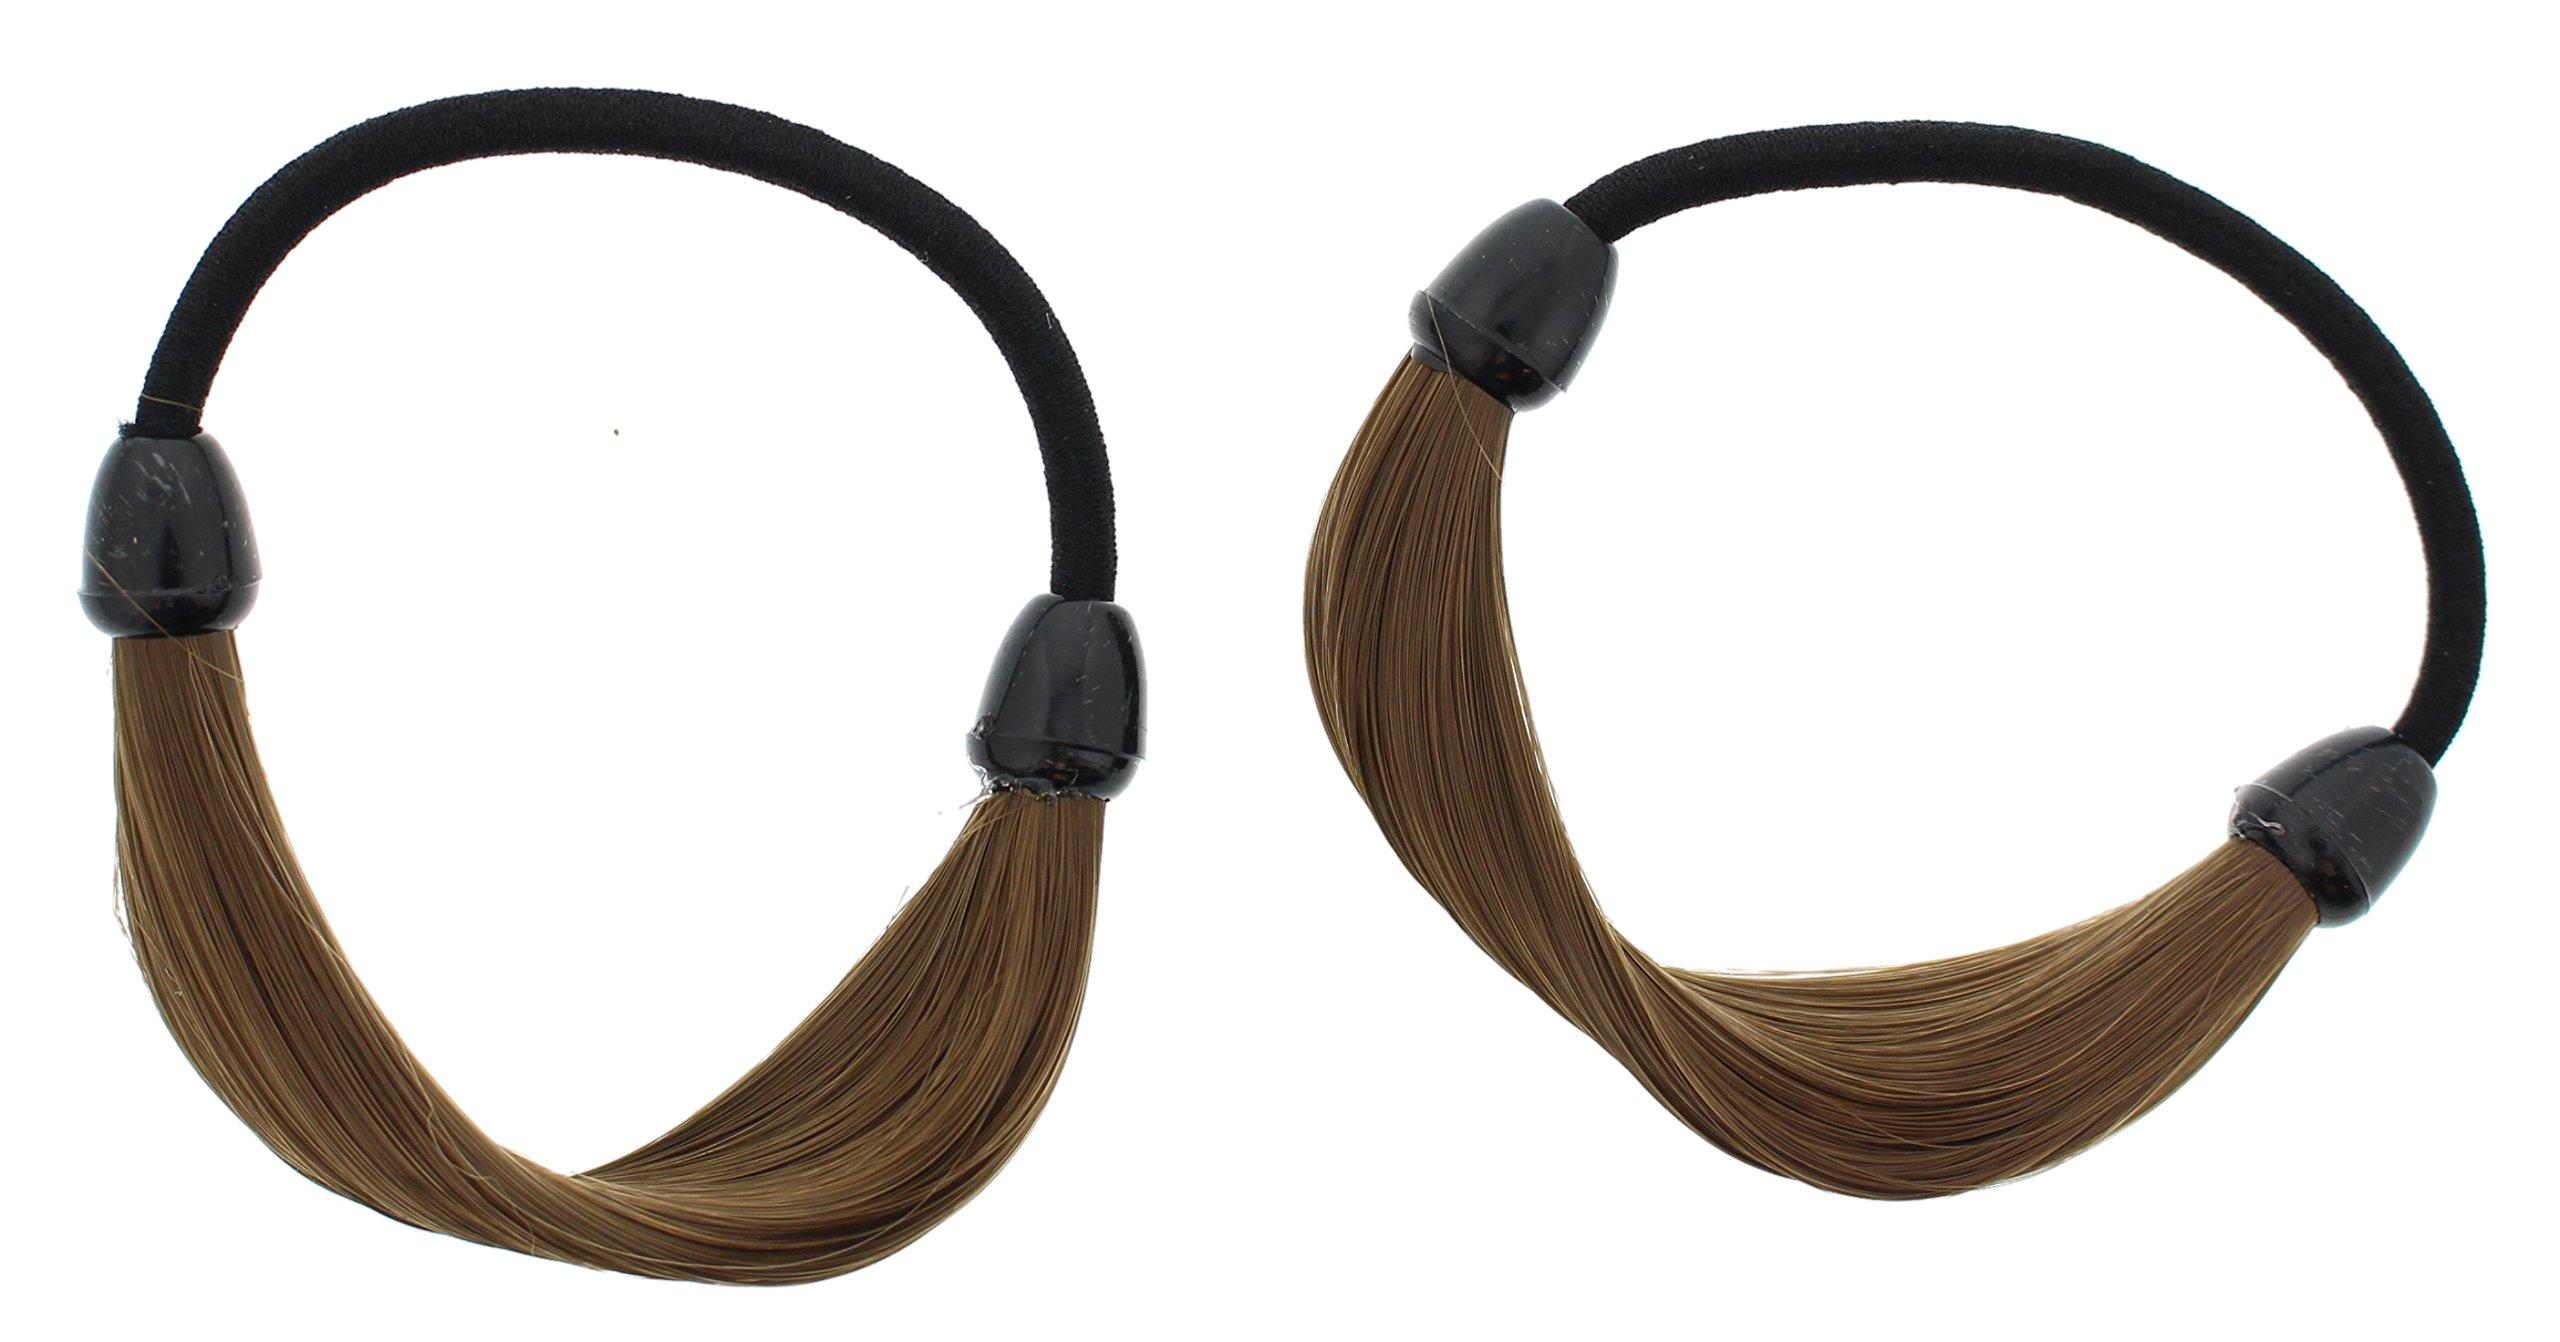 Making Waves Smooth Faux Hair Ponytail Holder (2Pcs) (Brown) by Making Waves